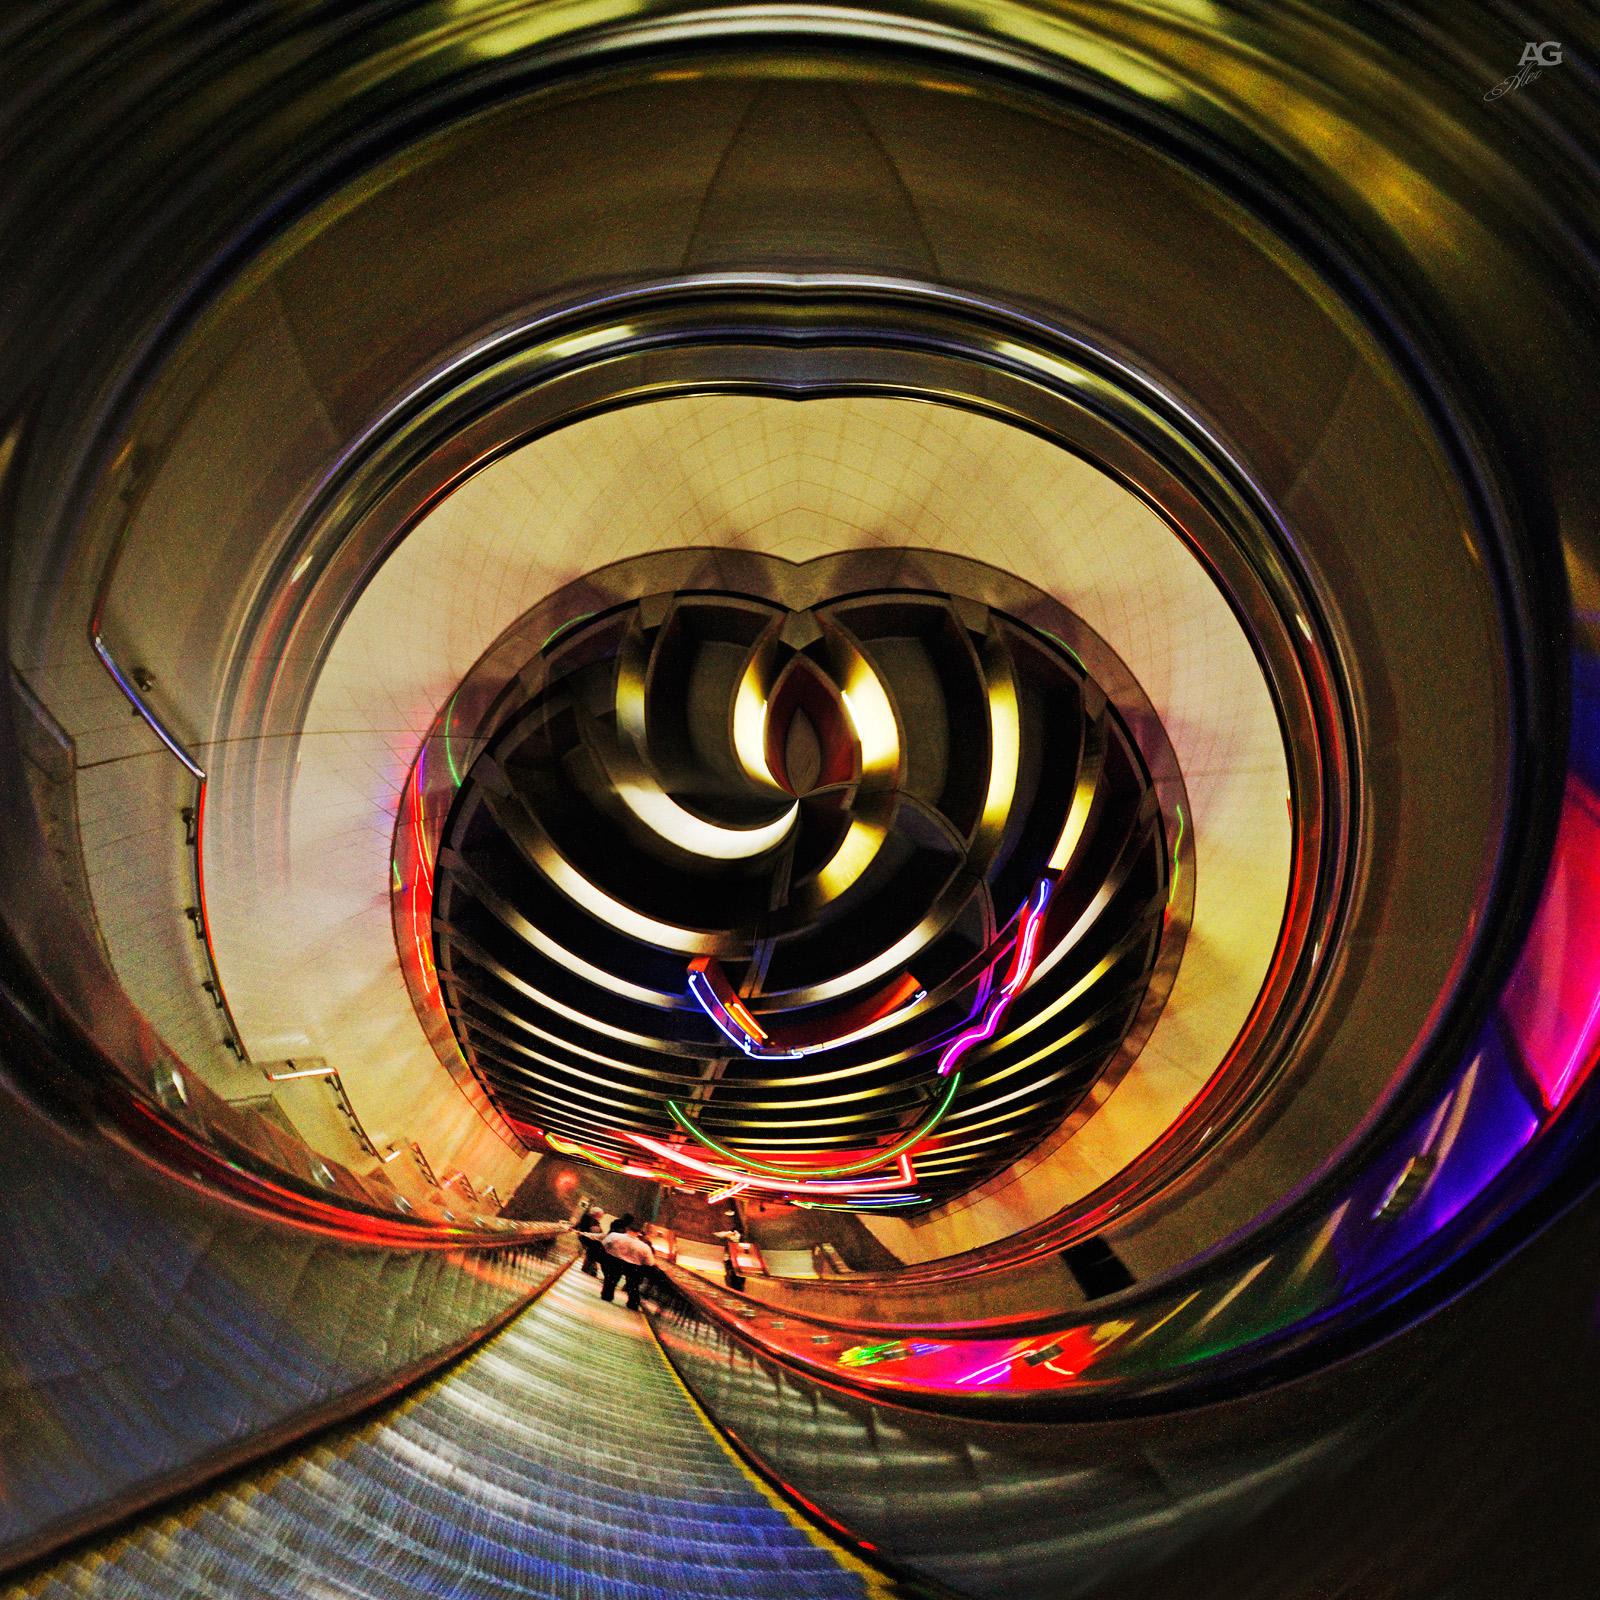 ElevatorOnExchangePlaceSubwayTrainPATHstation_POLAR_1600